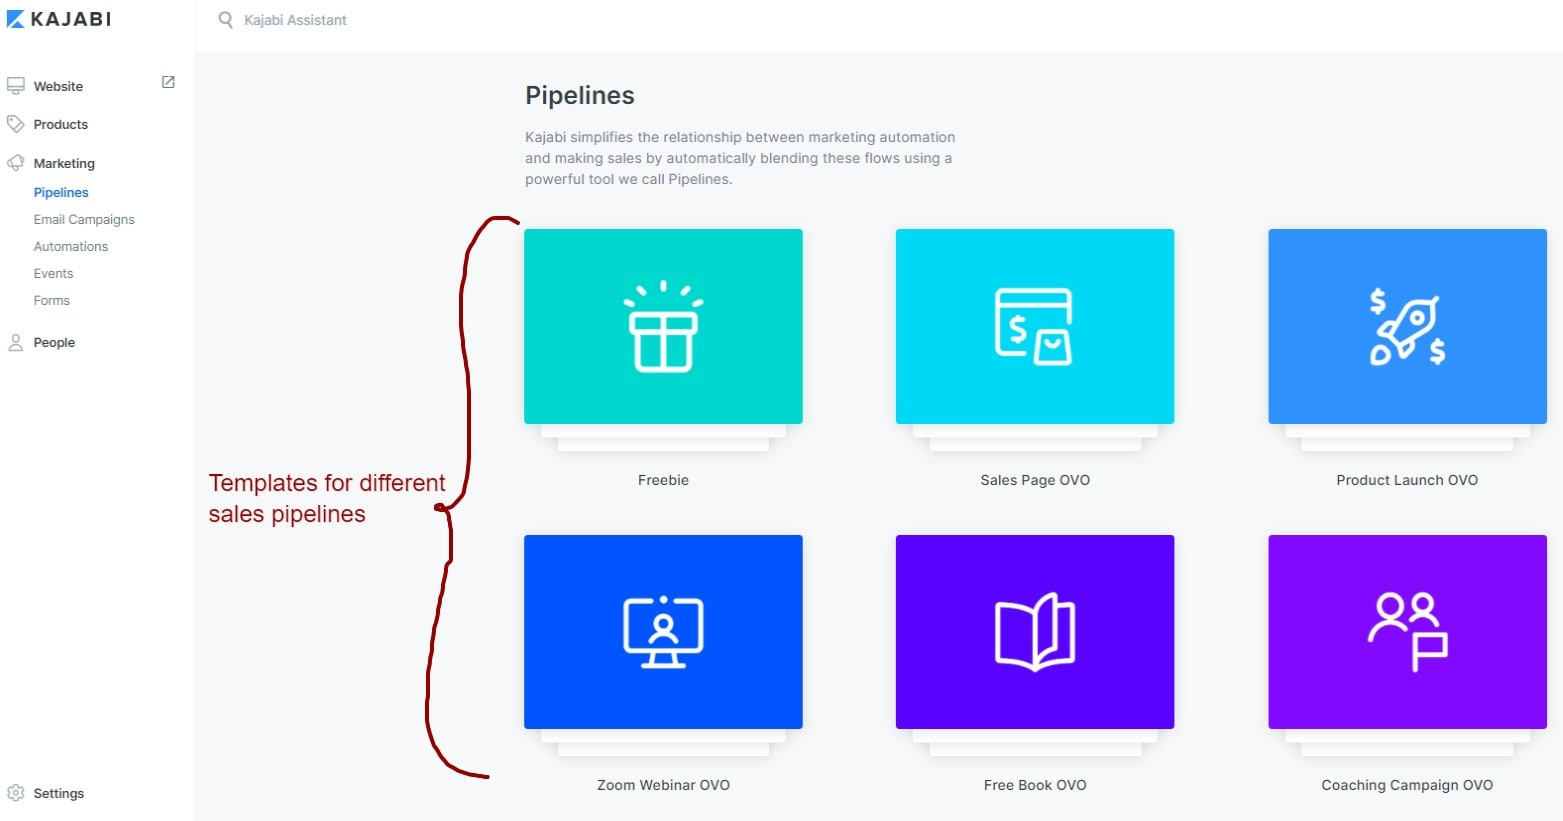 Kajabi pipelines blueprints